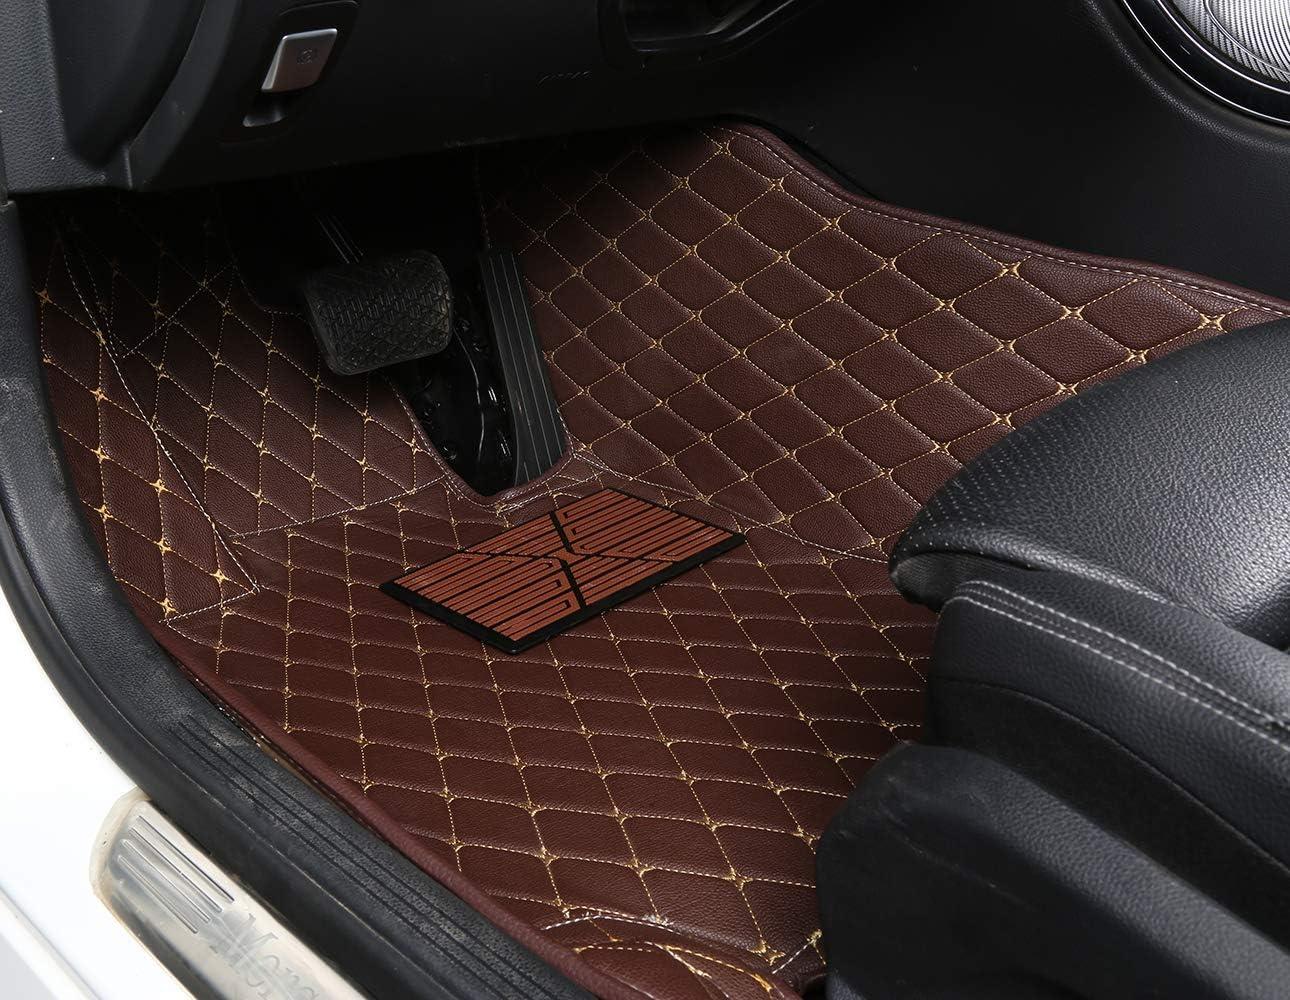 Bonus-Mats Custom Fit Luxury XPE Leather All-Weather Full Surrounded Waterproof Car Floor Mats Floor Liners for Mercedes Benz AMG C43 AMG C63 2015-2020 Sedan Beige